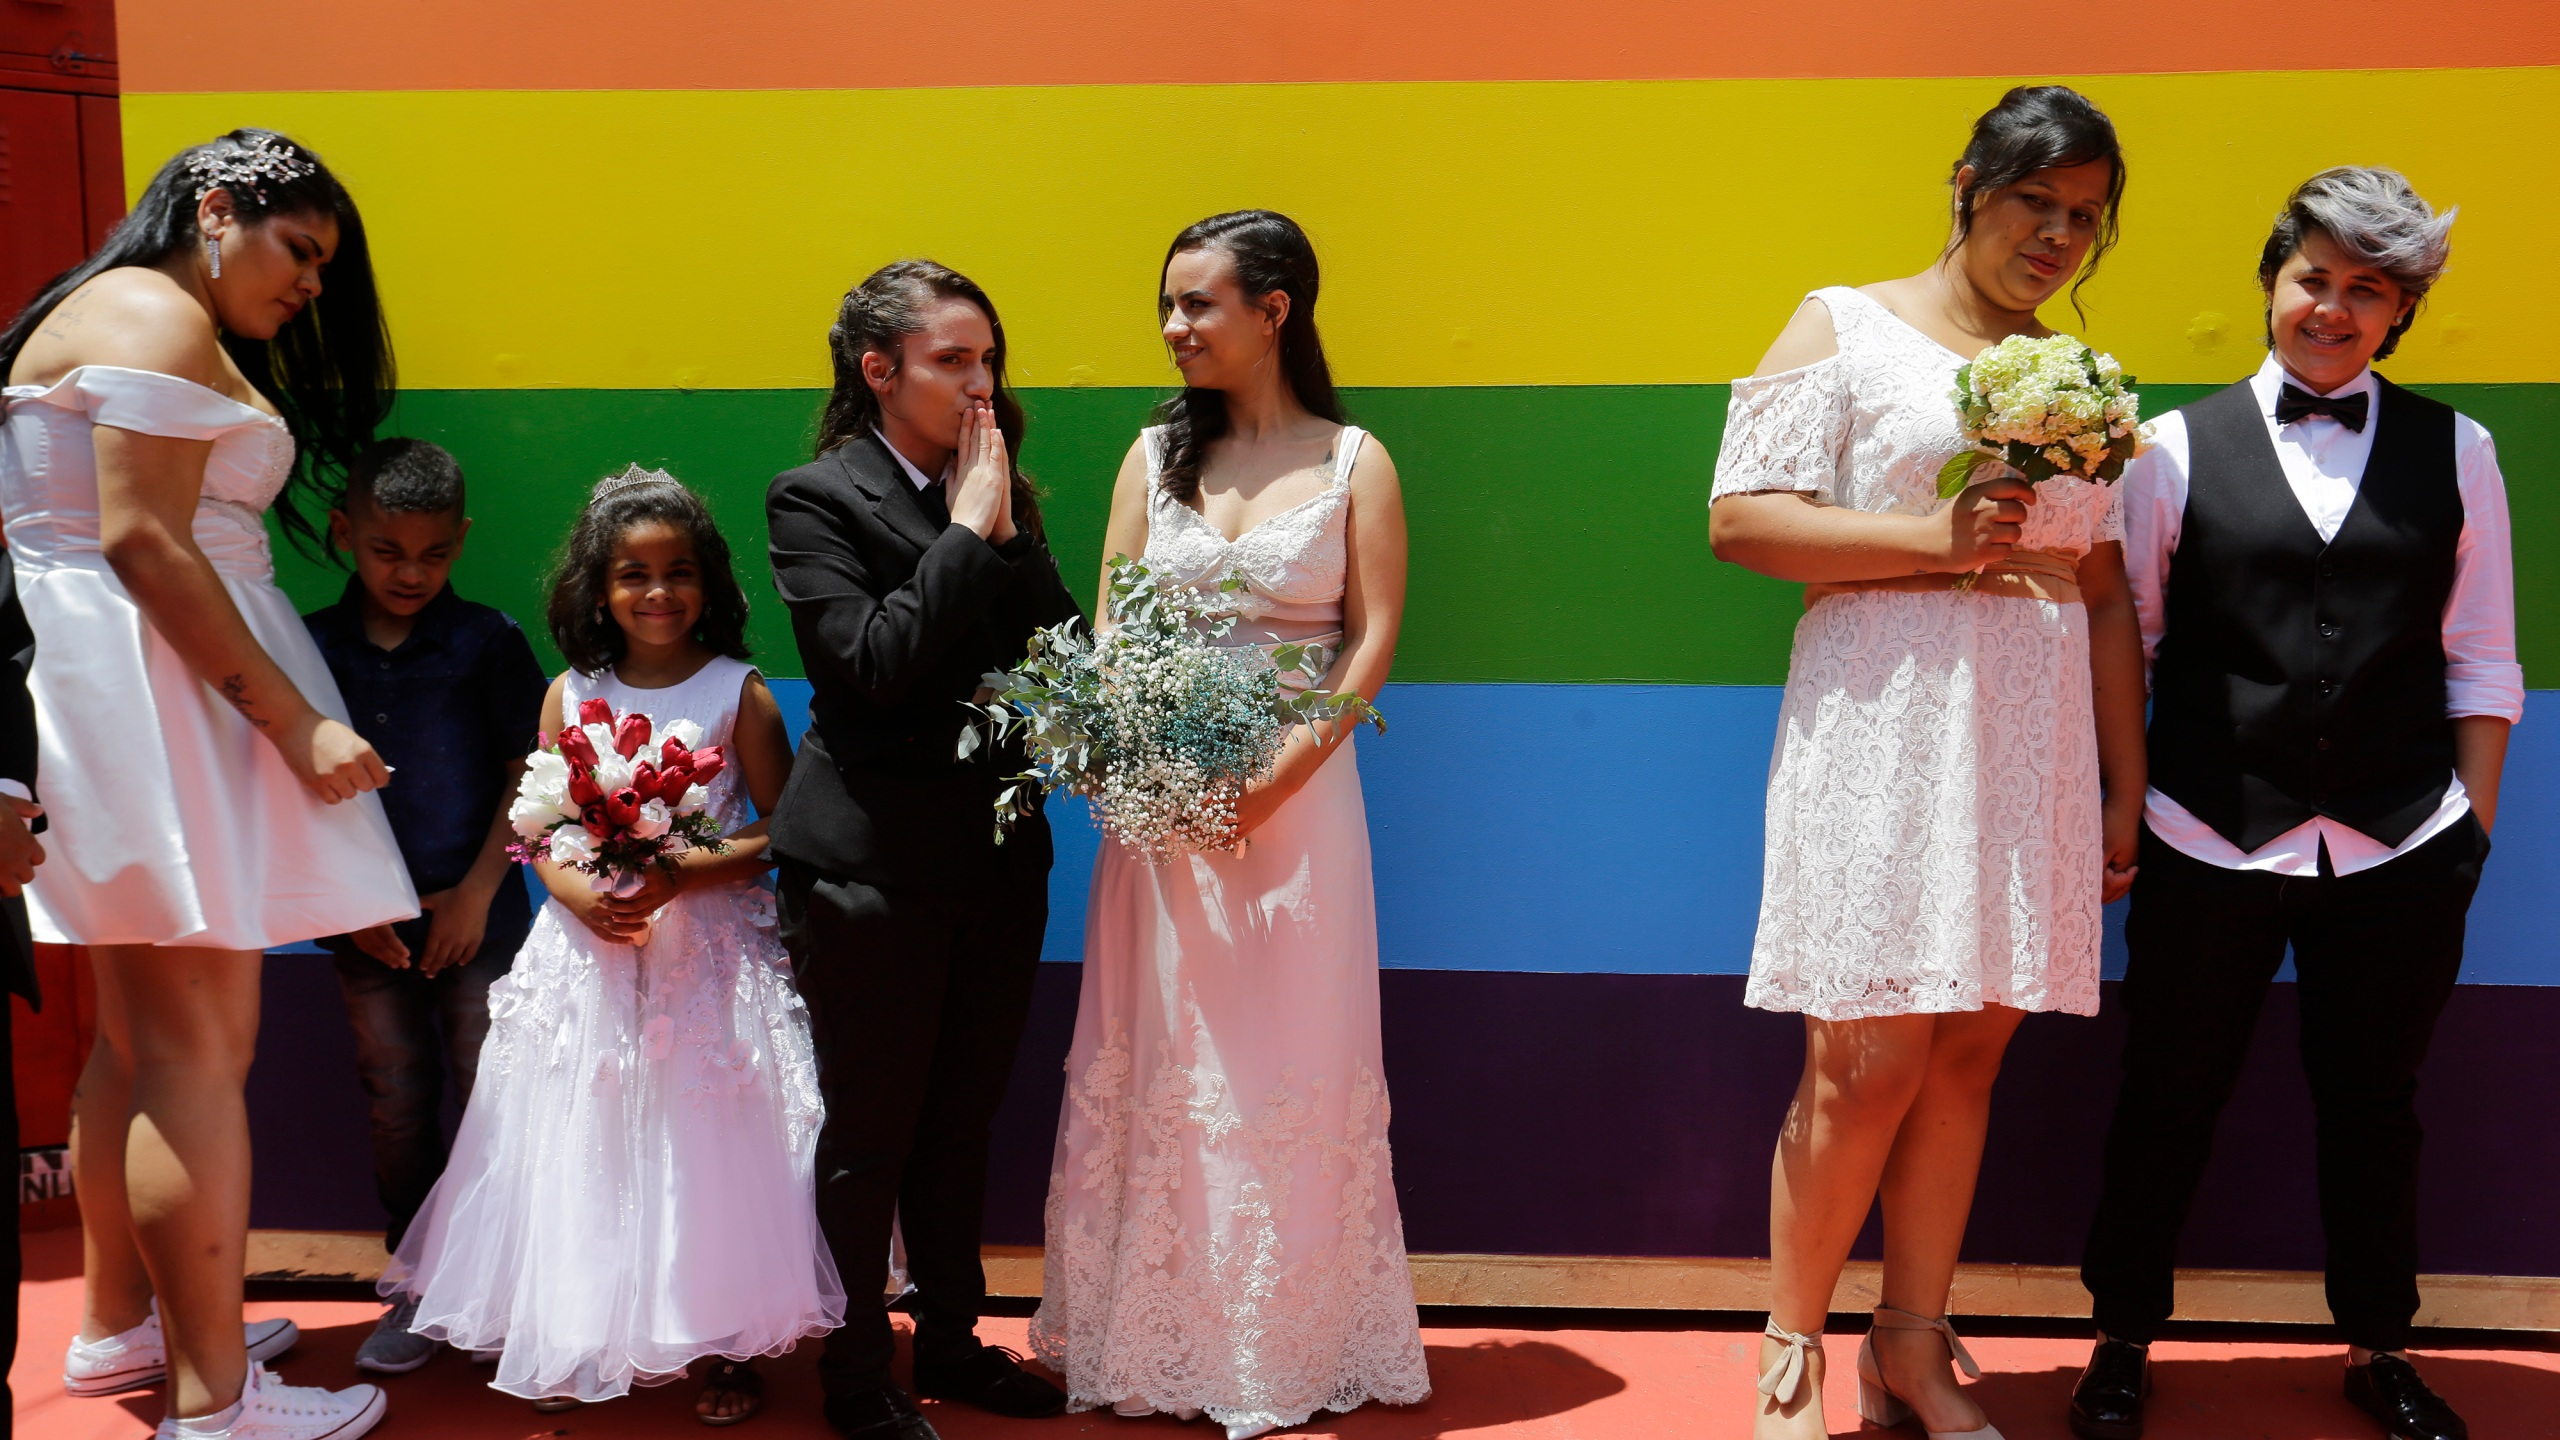 Brazil Homophobia_1560483644788